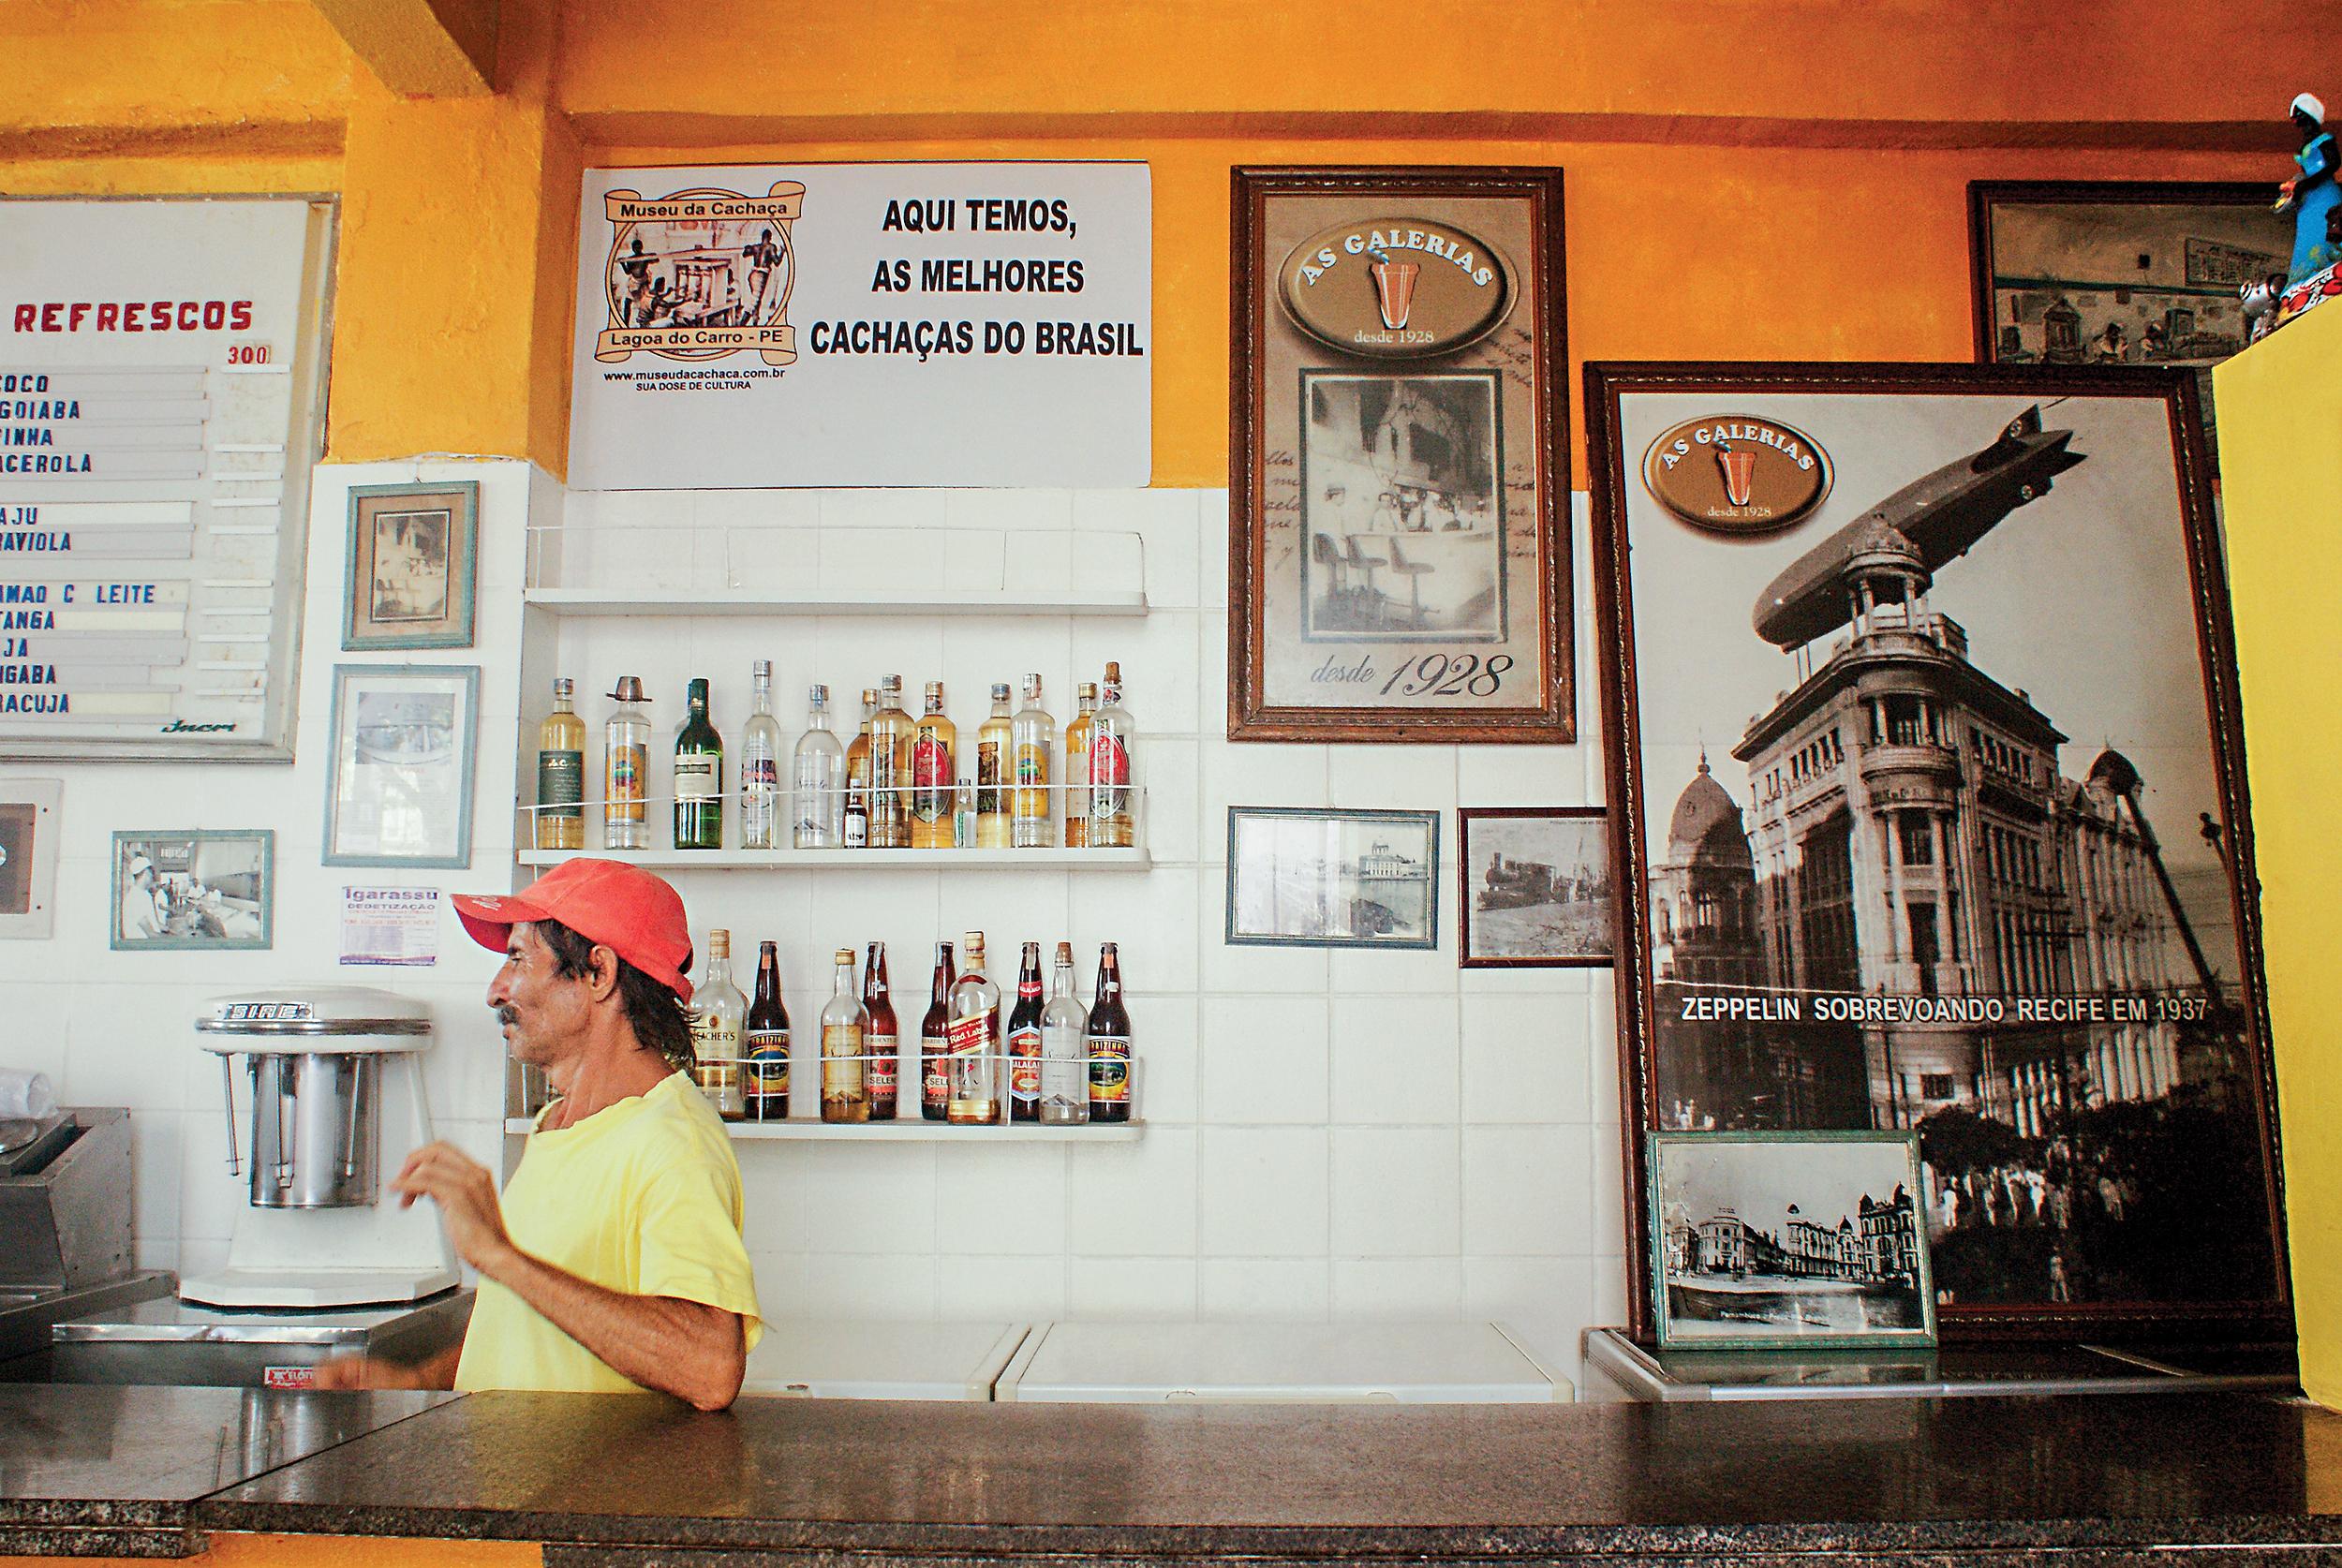 Lanchonete As Galerias, em Recife, Pernambuco